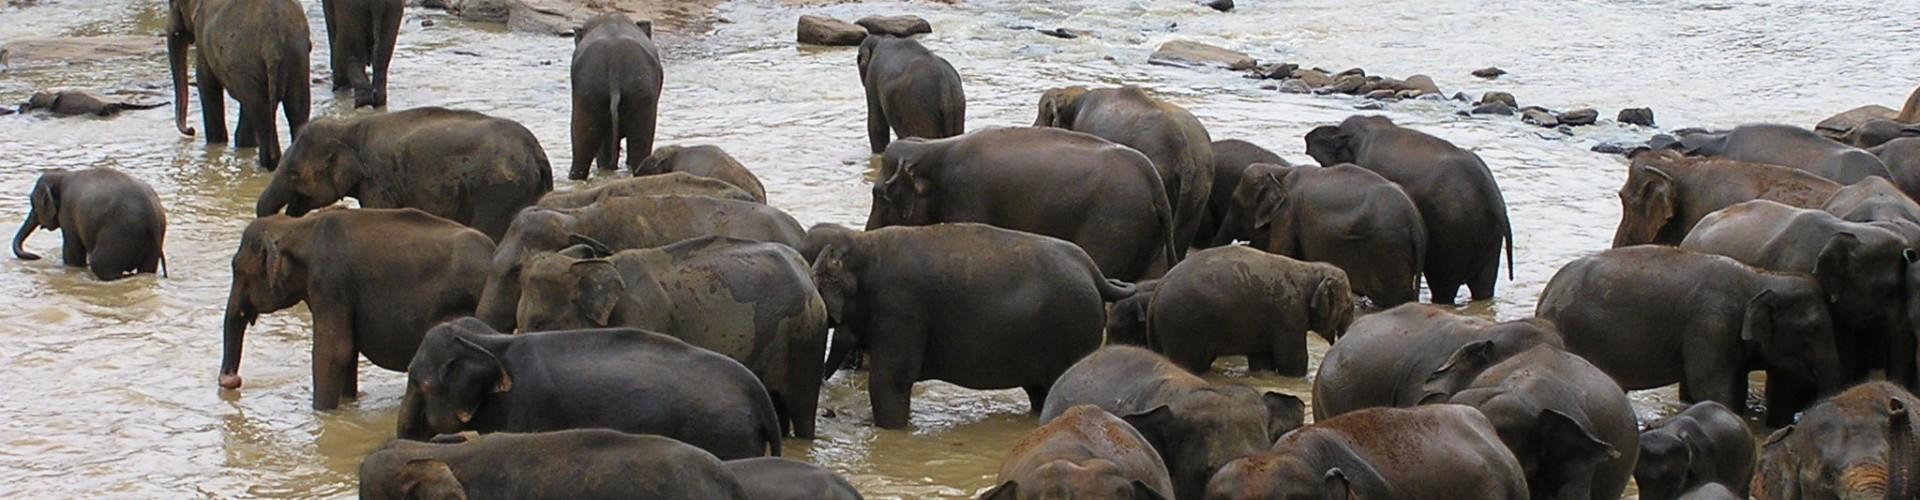 Elephants bathing, Sri Lanka